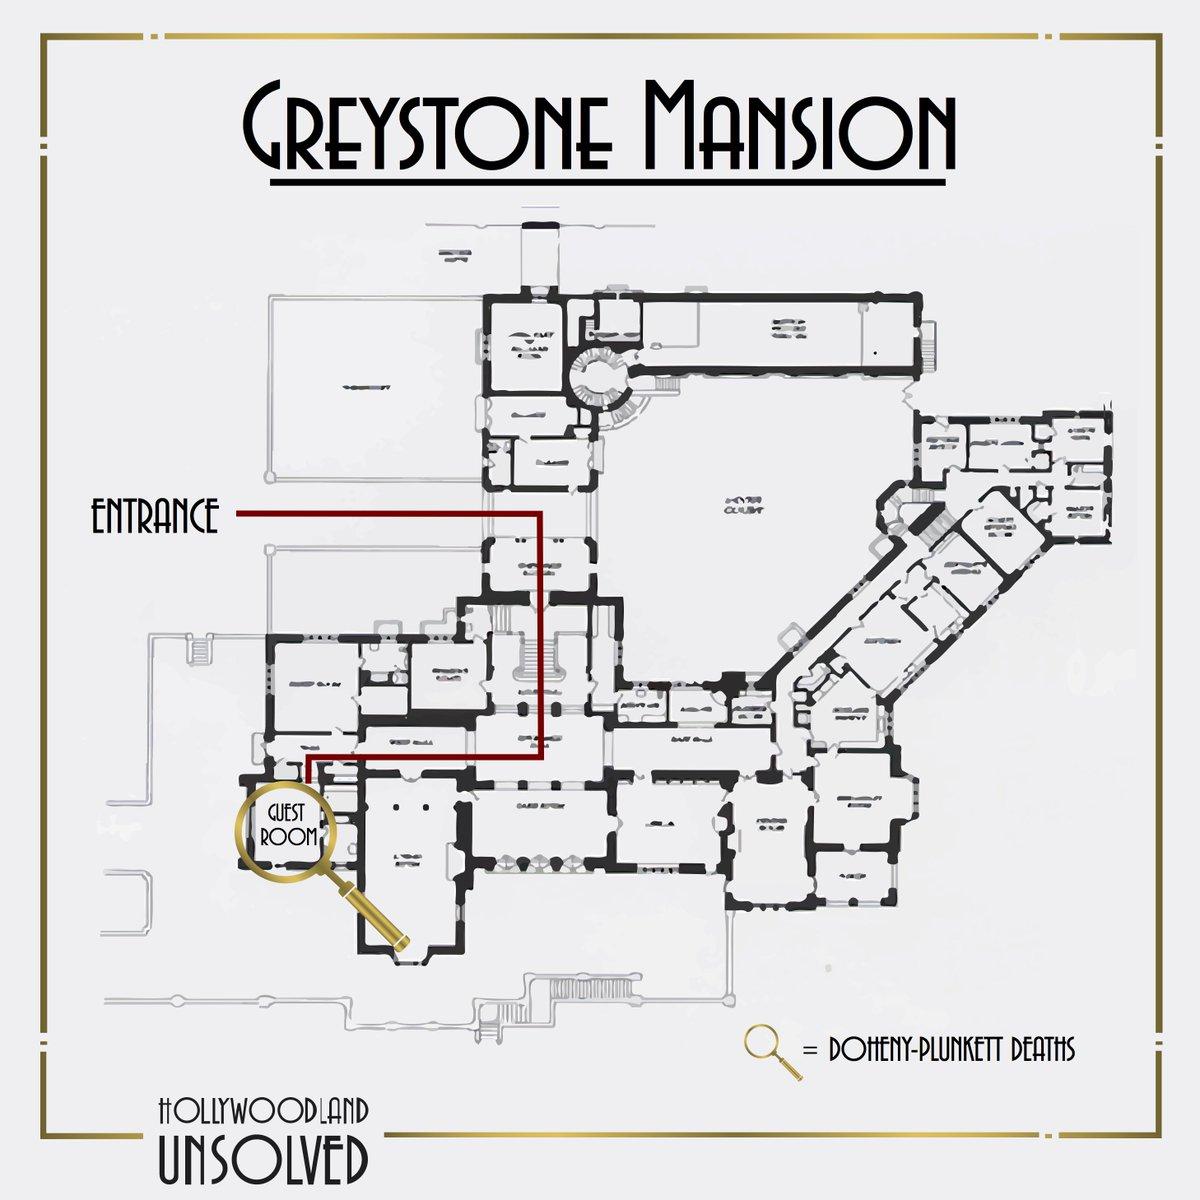 Greystone mansion floor plan meze blog for Greystone homes floor plans